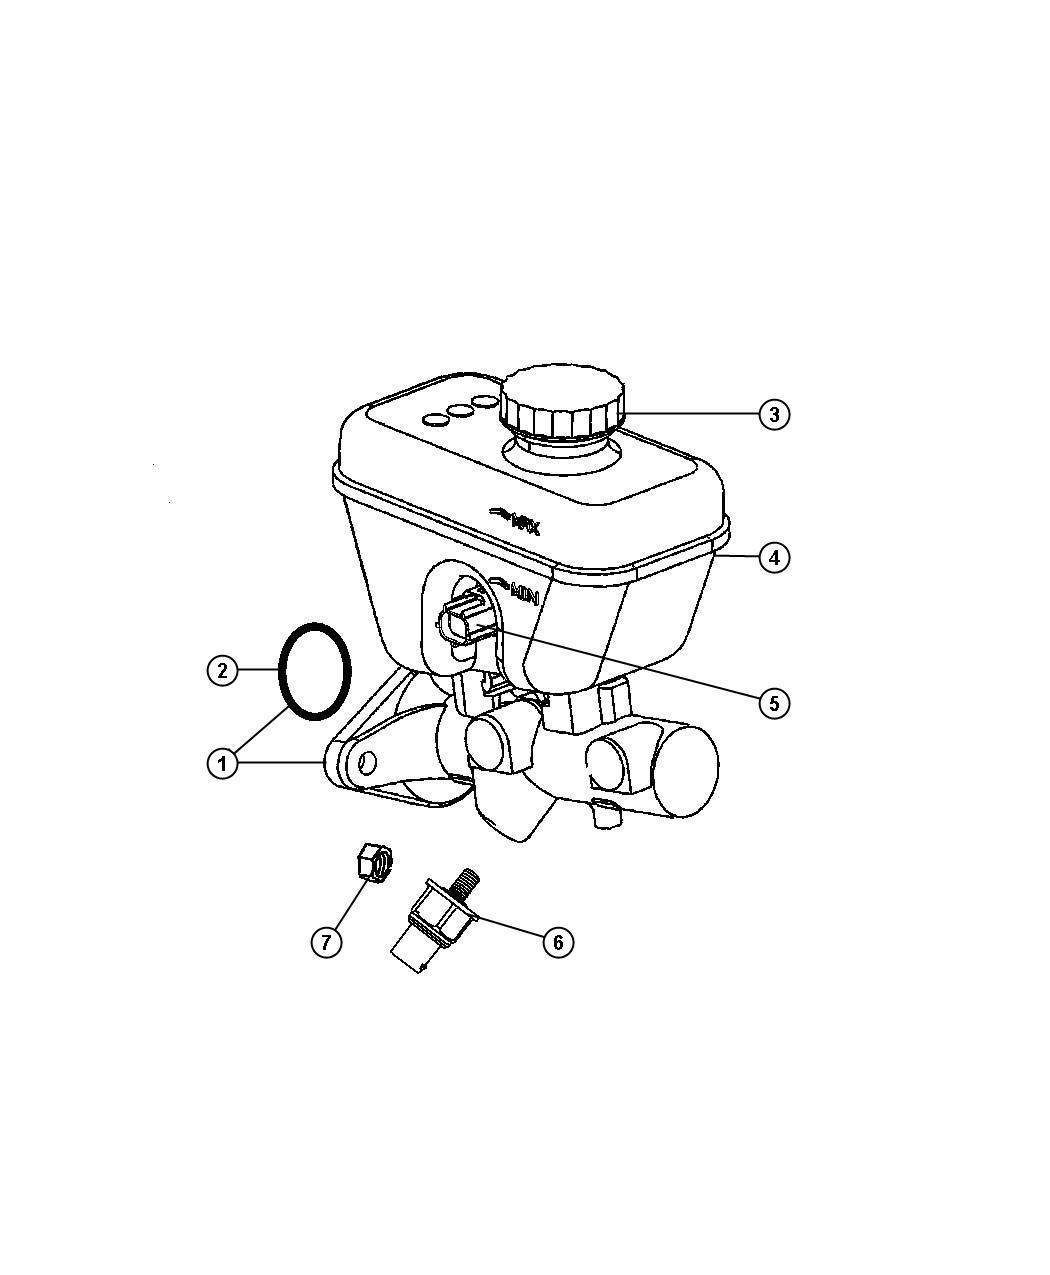 Dodge Sprinter 3500 Sensor. Exhaust back pressure, fuel